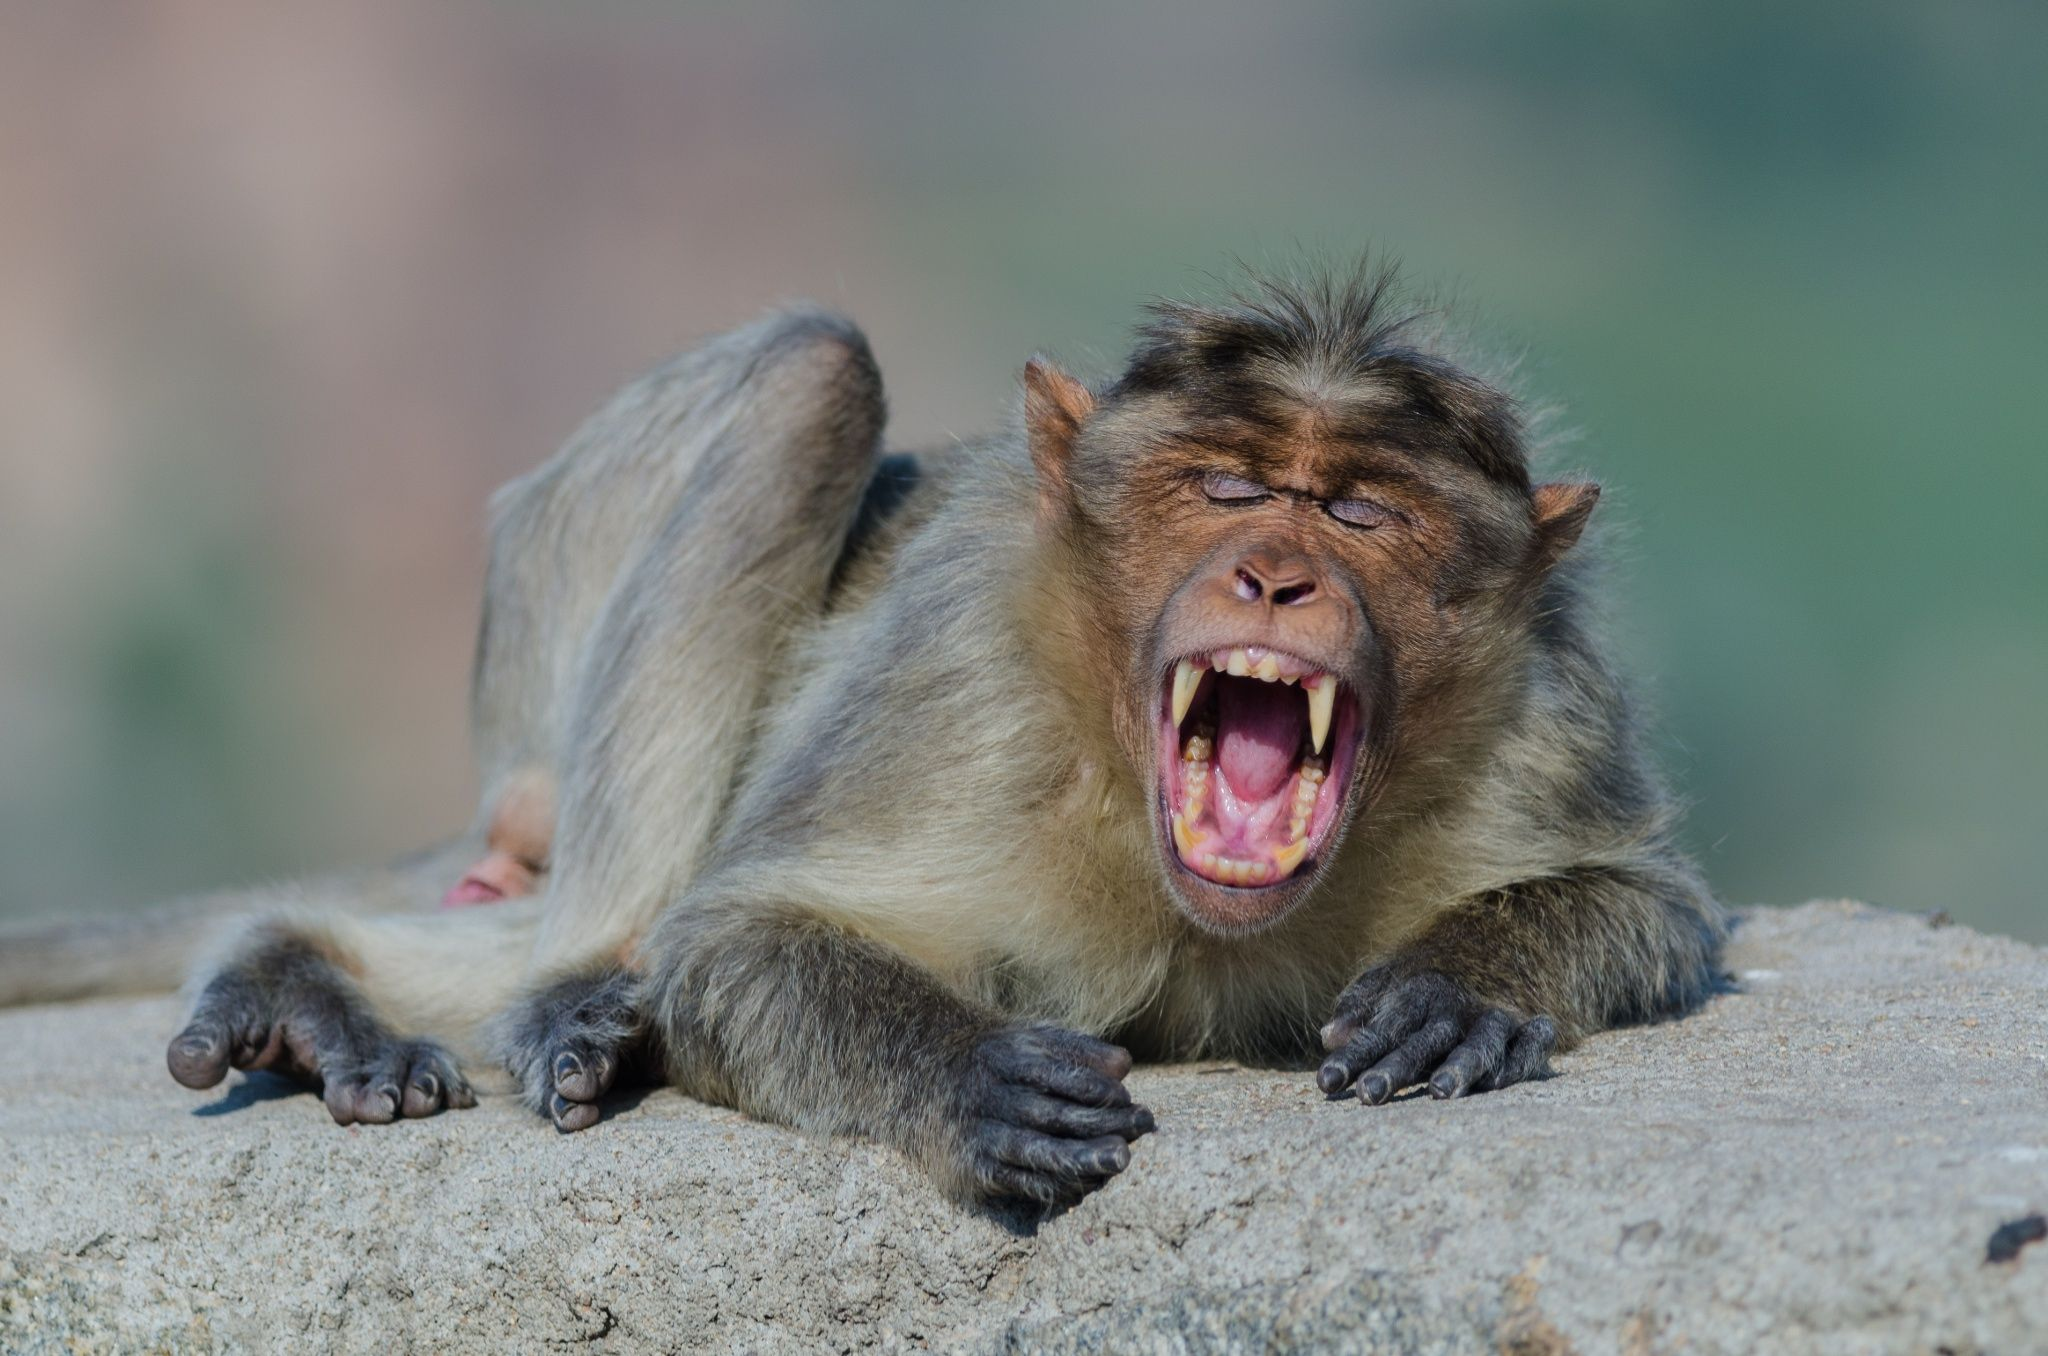 A Tired Monkey is a Happy Monkey by Ohad Uliel